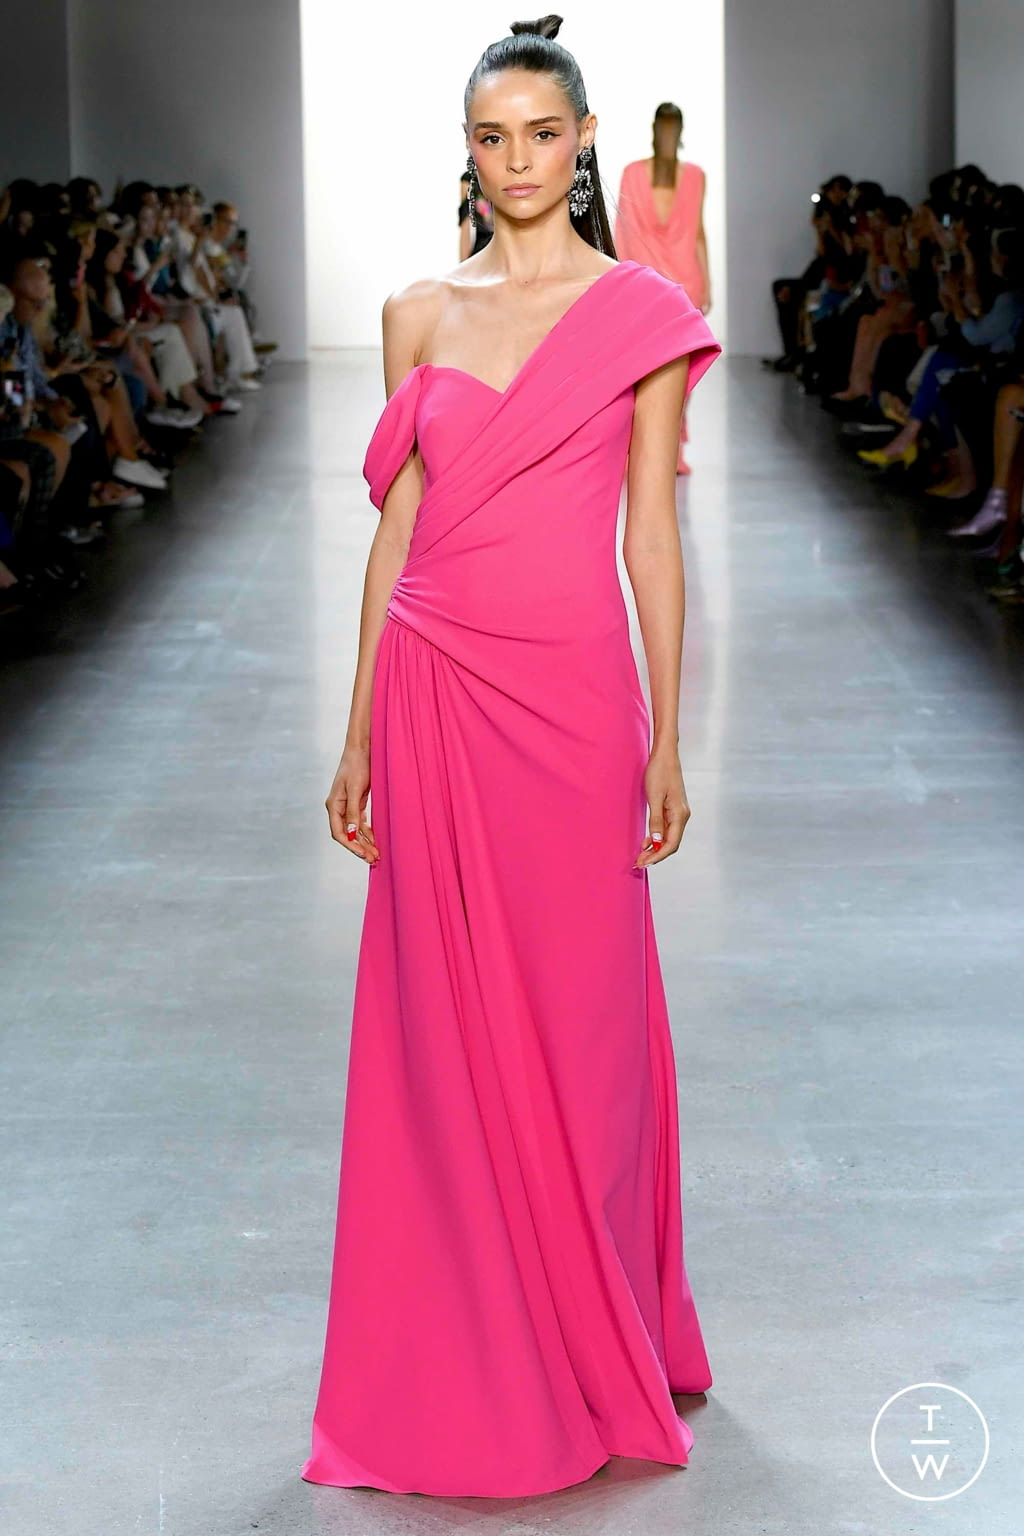 Fashion Week New York Spring/Summer 2020 look 16 from the Tadashi Shoji collection 女装